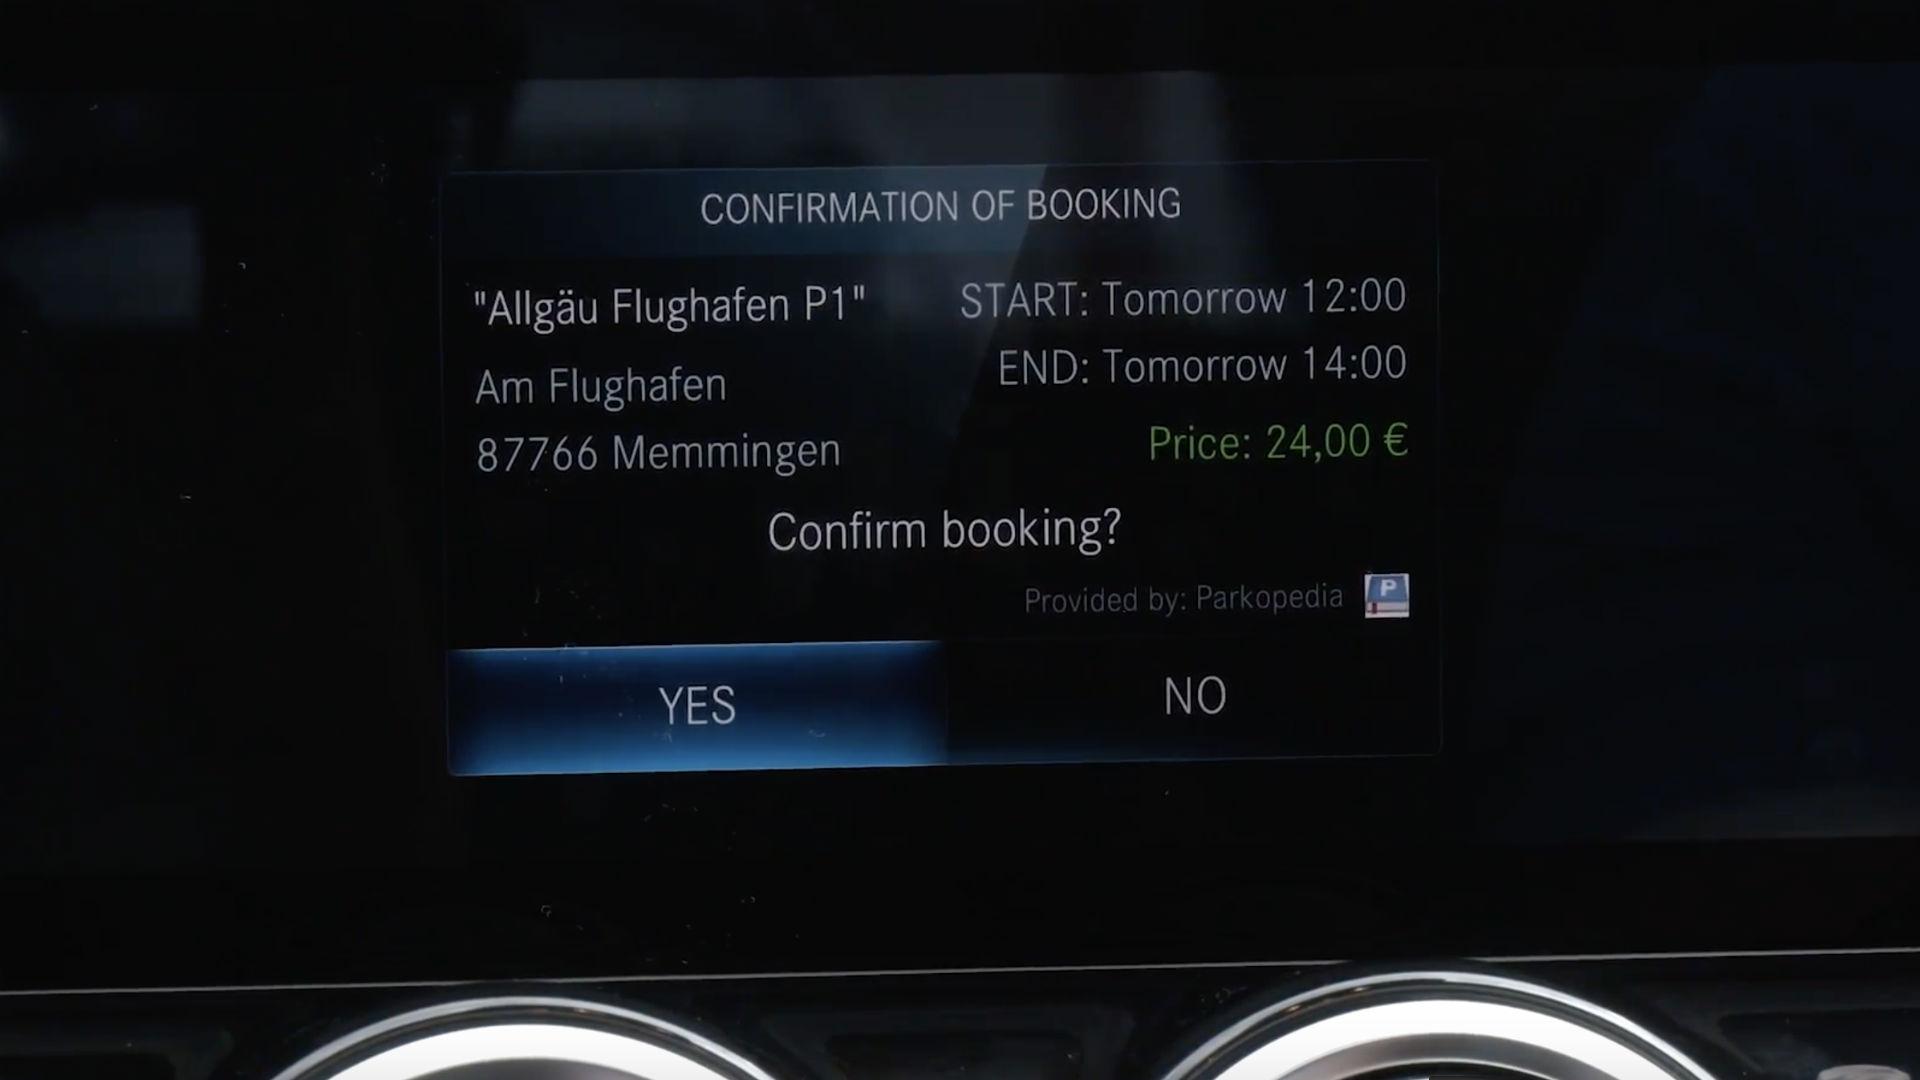 Mercedes parking payment